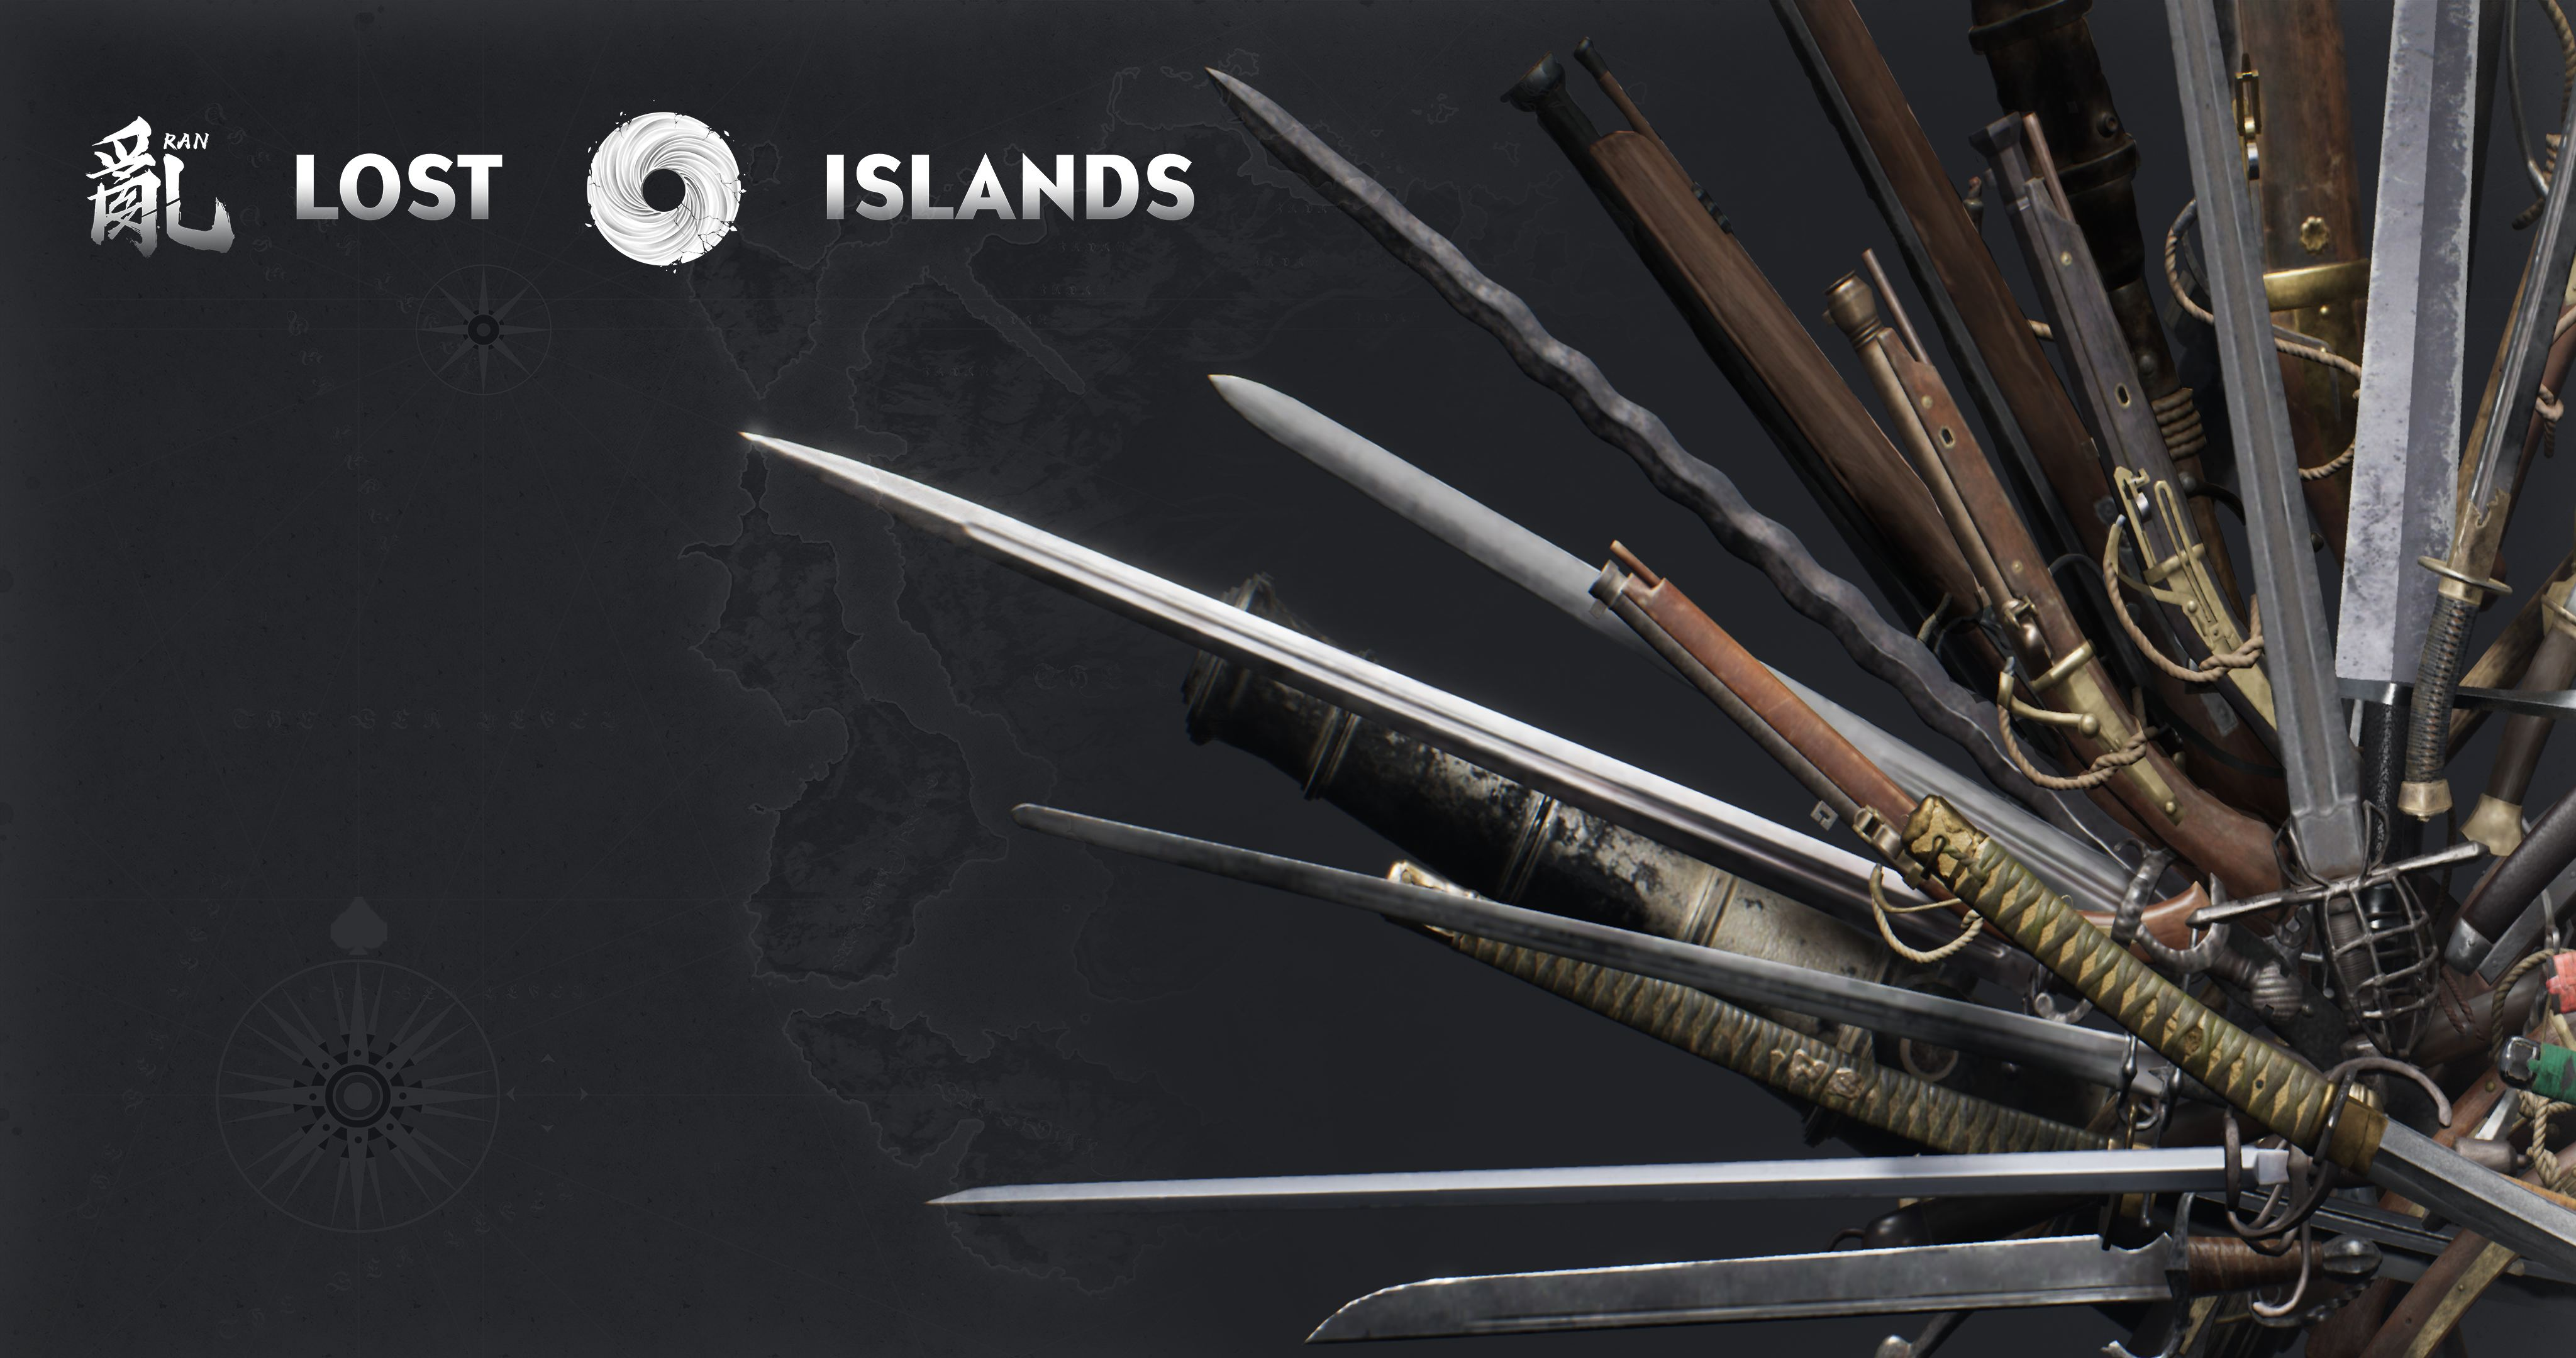 RAN Lost Islands Weaponry 03